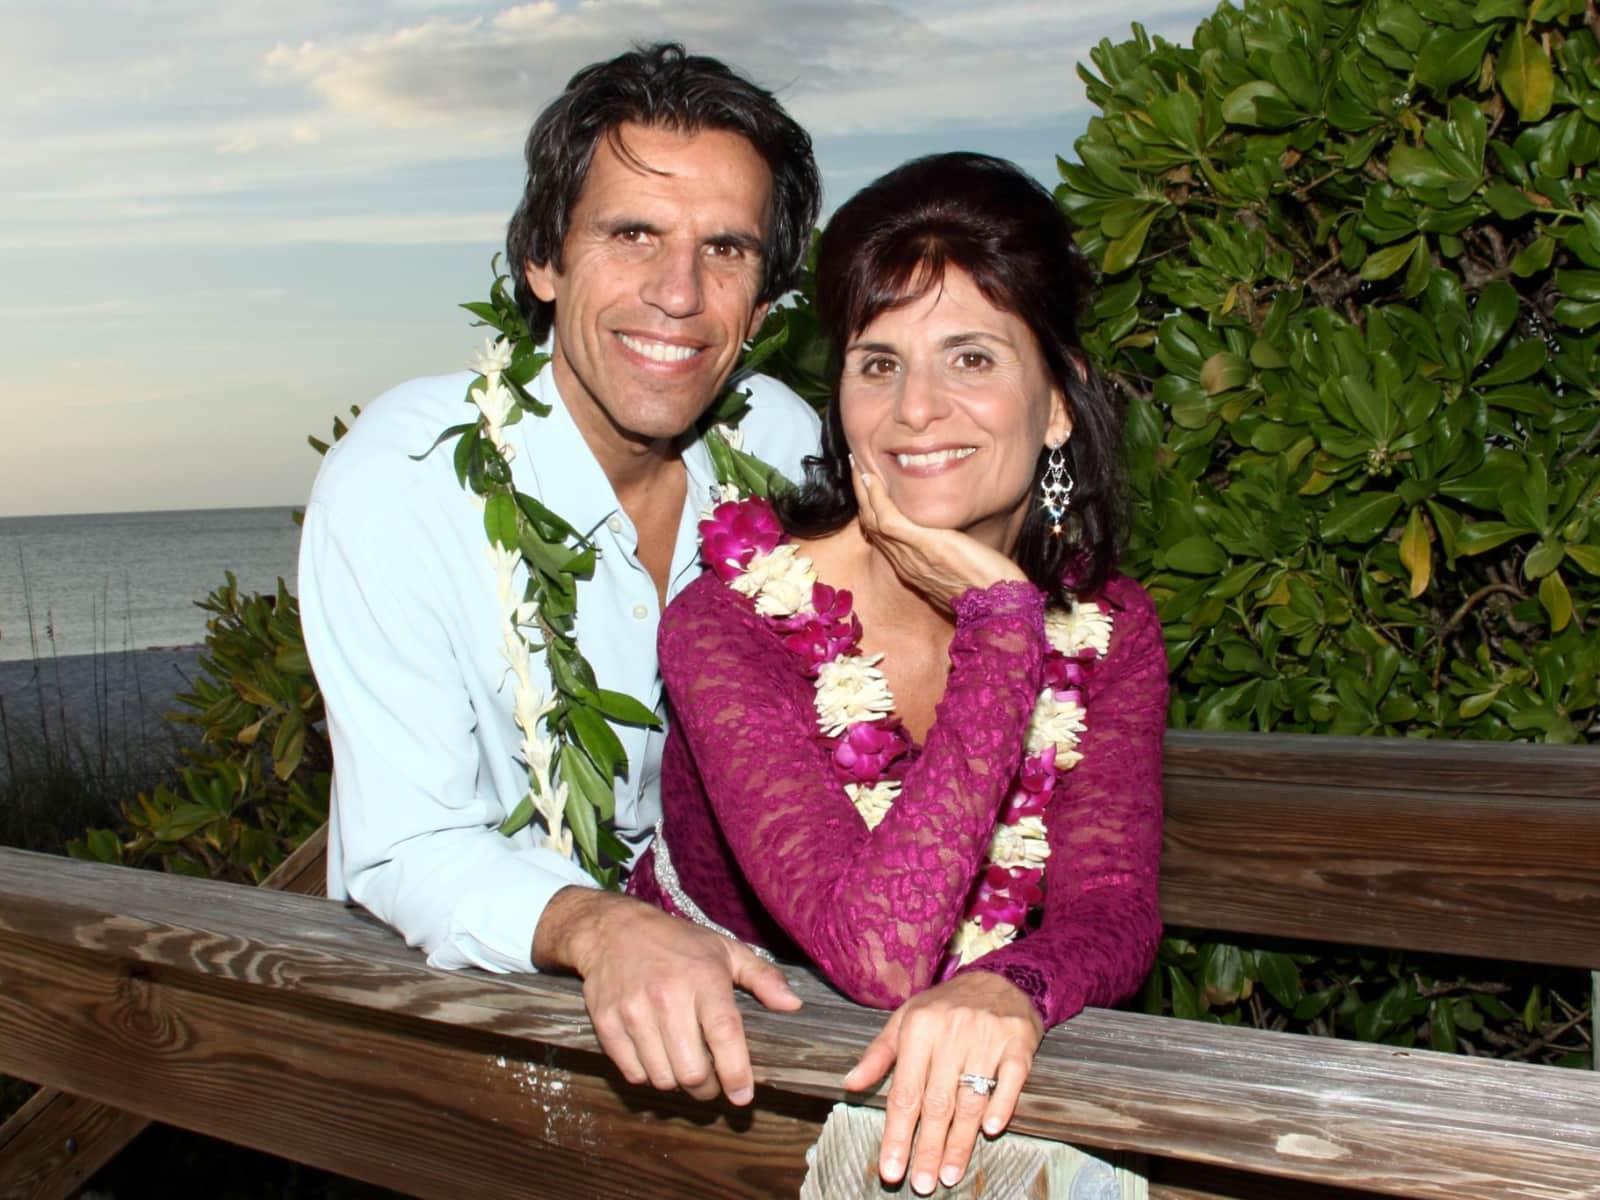 Rosanna & Mladen from Florida, United States